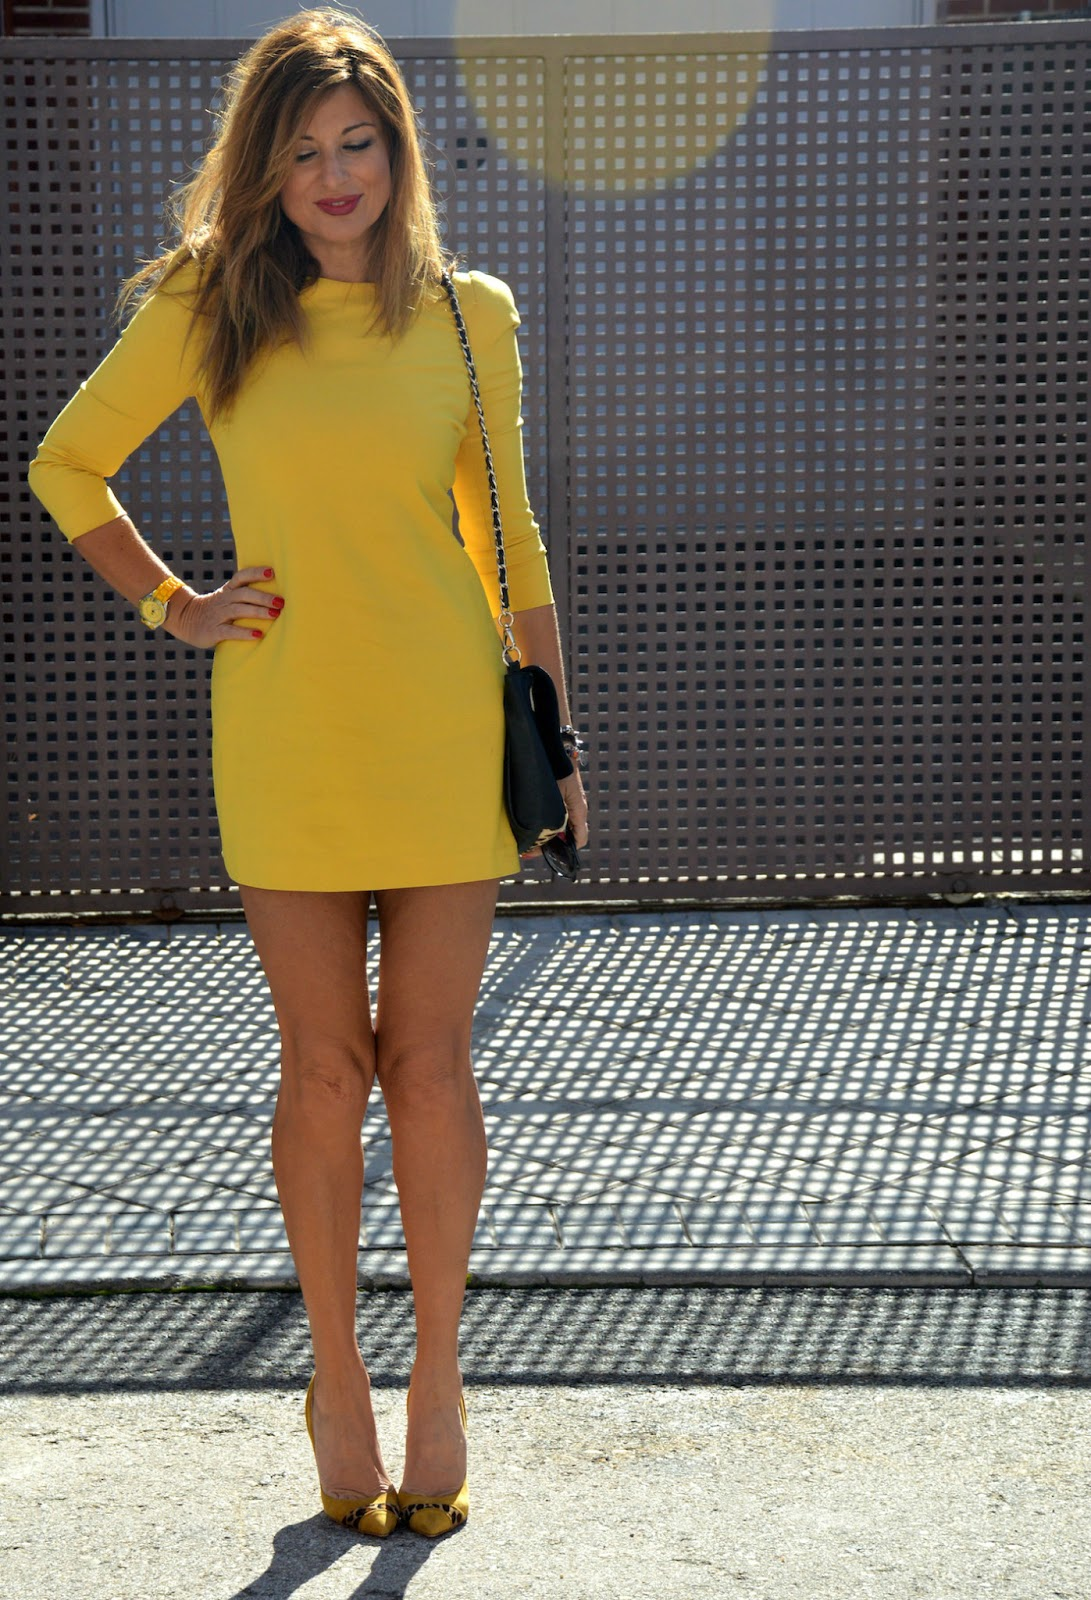 Color Vestido Mostaza Mostaza Larga Manga qVSUzpGM